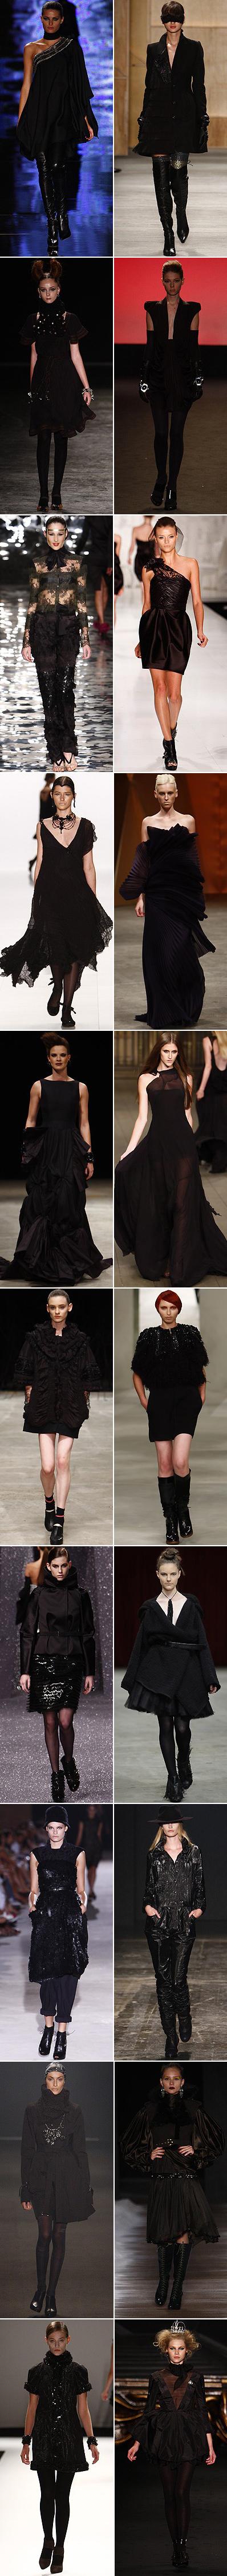 blacks2009